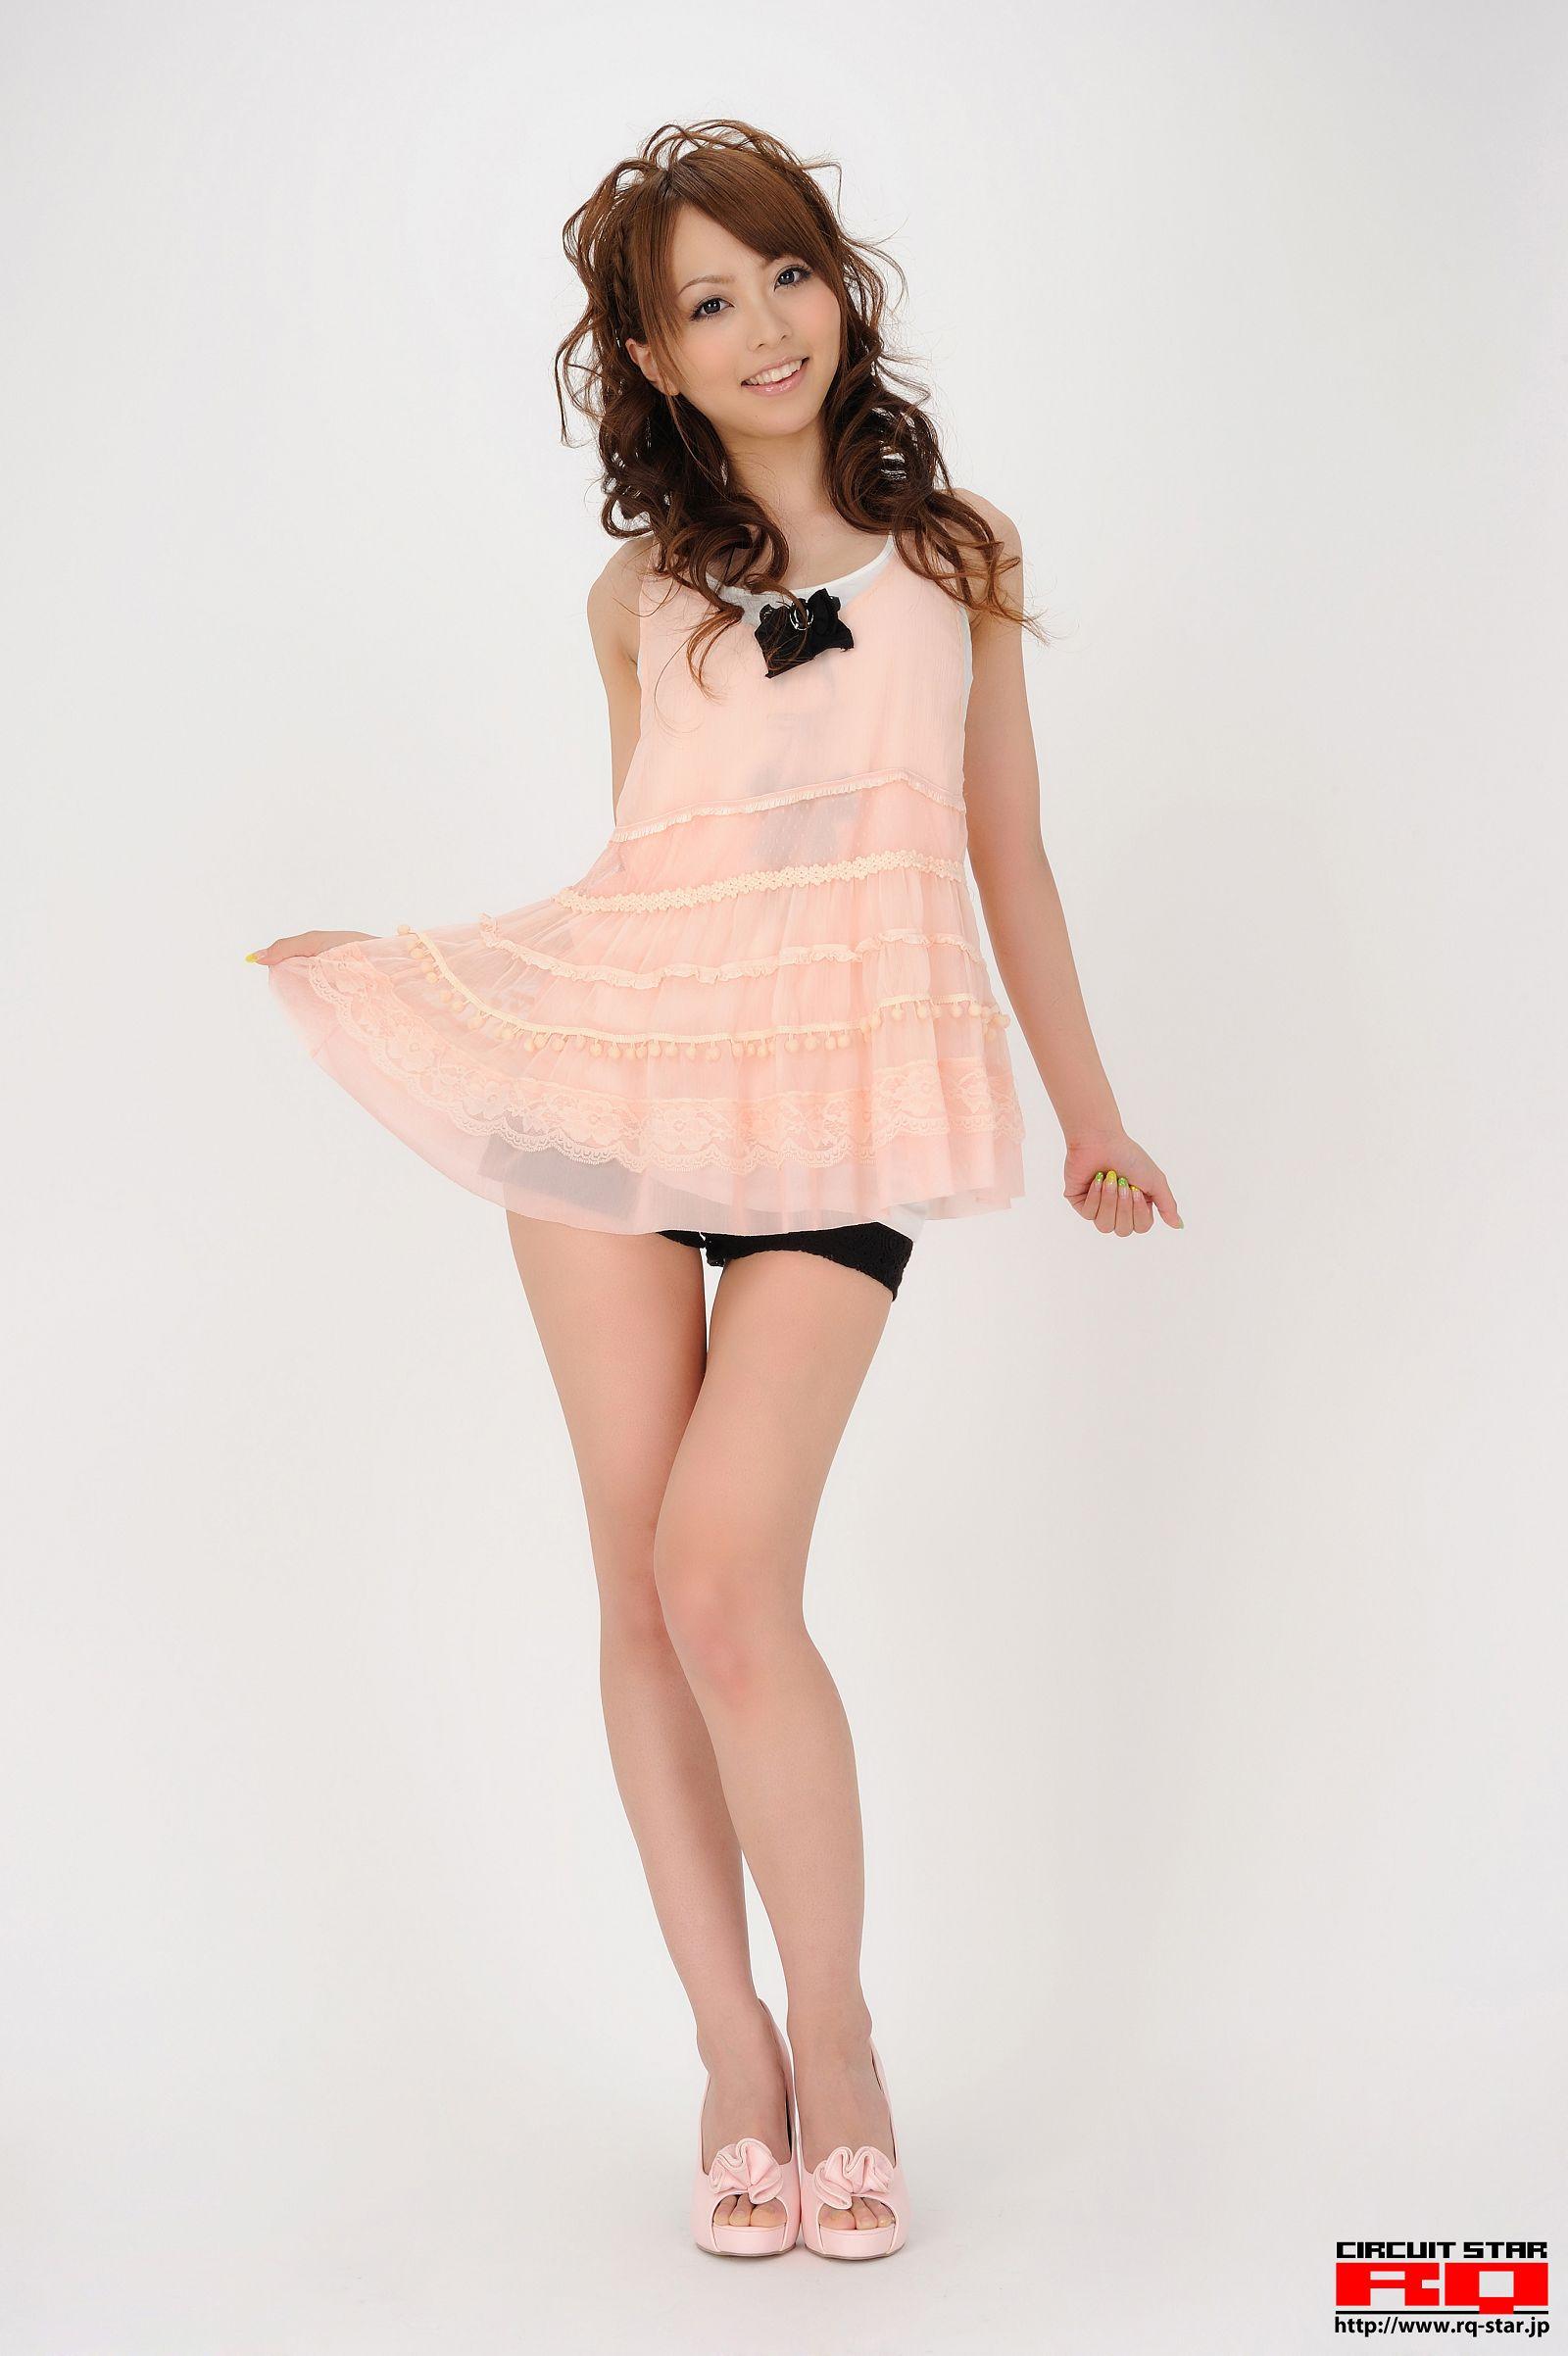 [RQ STAR美女] NO.0297 Momoka Narushima 成島桃香 Private Dress[100P] RQ STAR 第4张